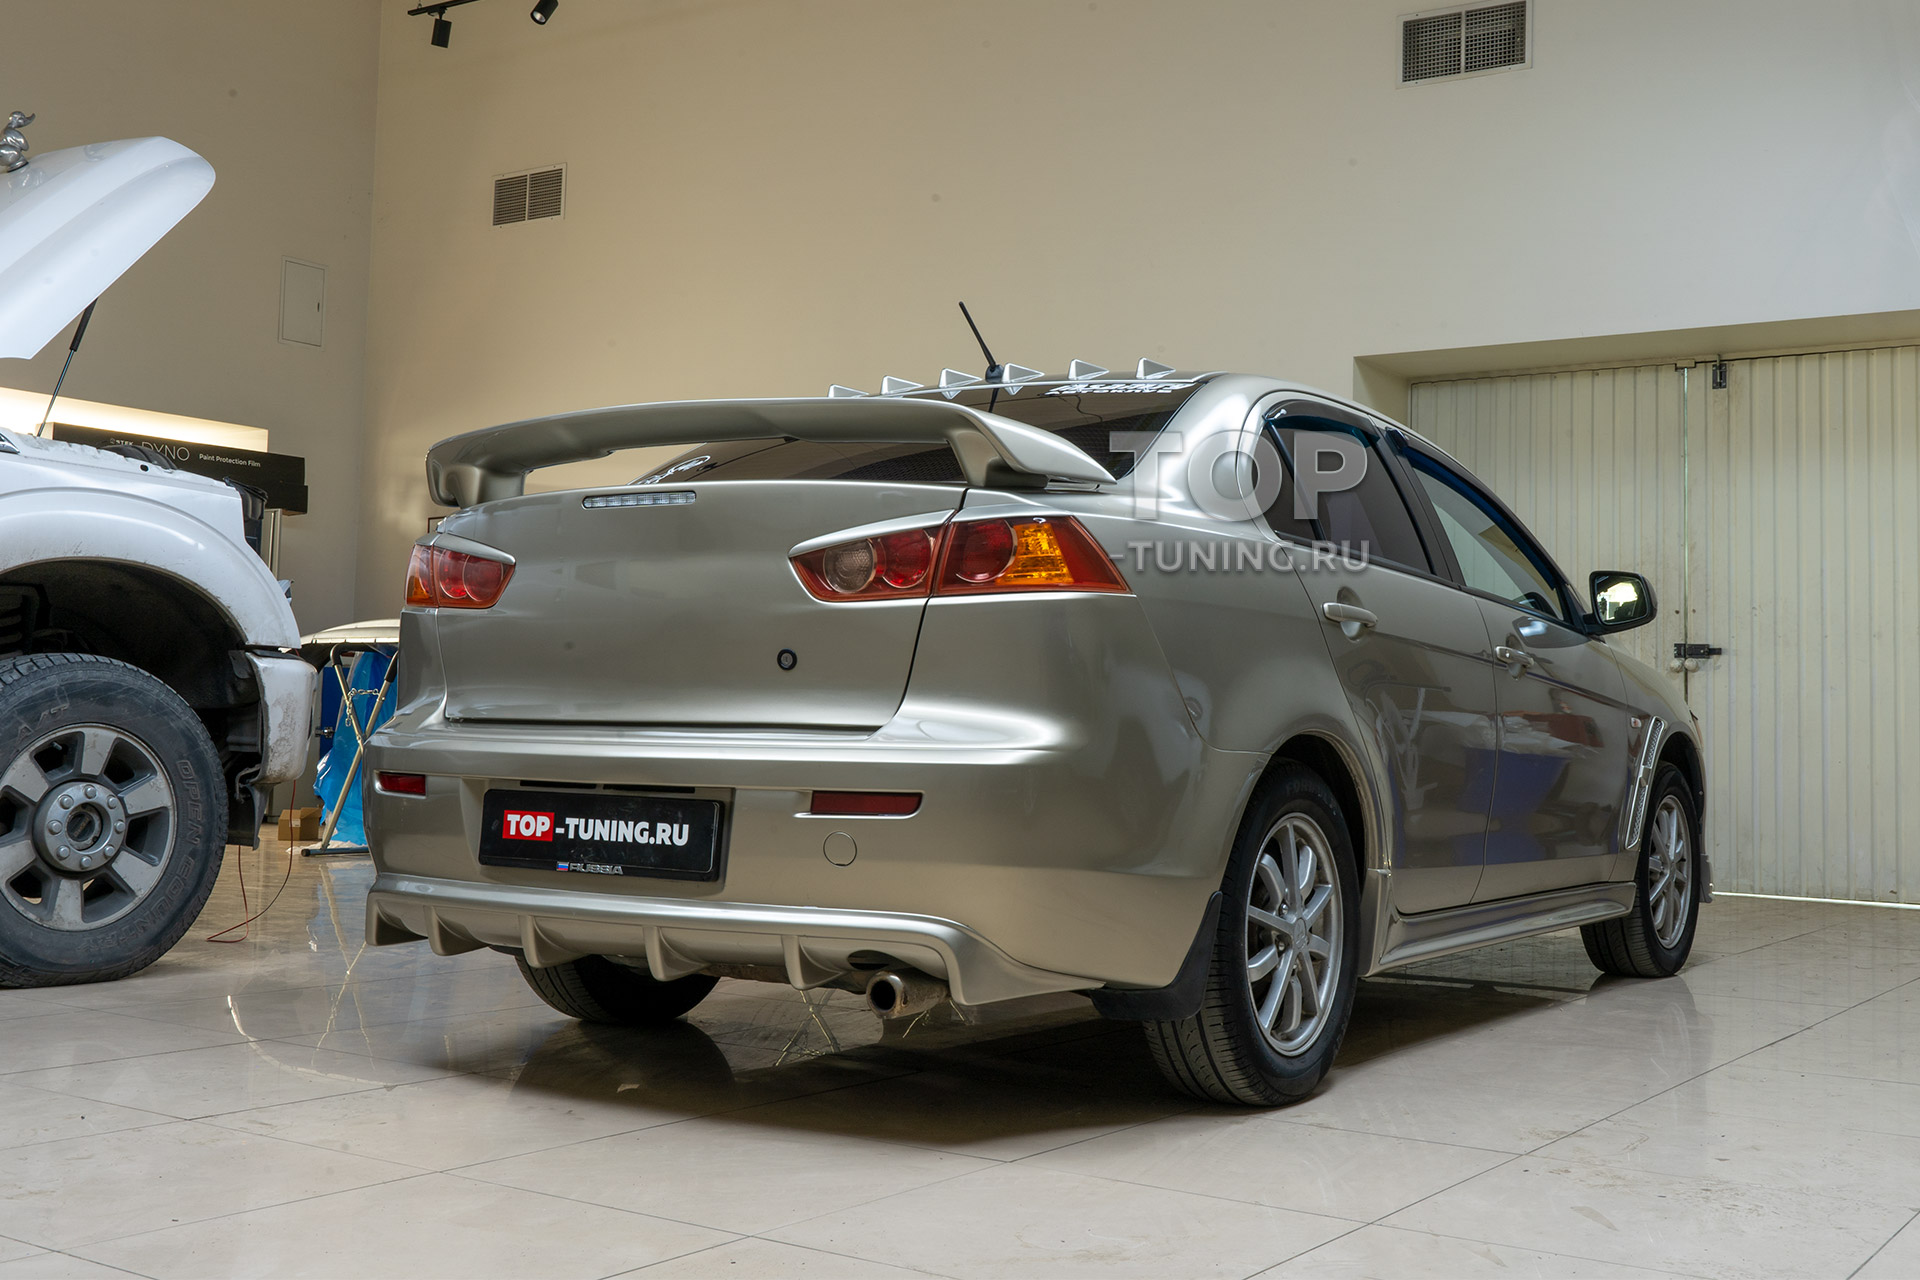 Монтаж аксессуаров и установка тюнинг обвеса из пластика для Mitsubishi Lancer X